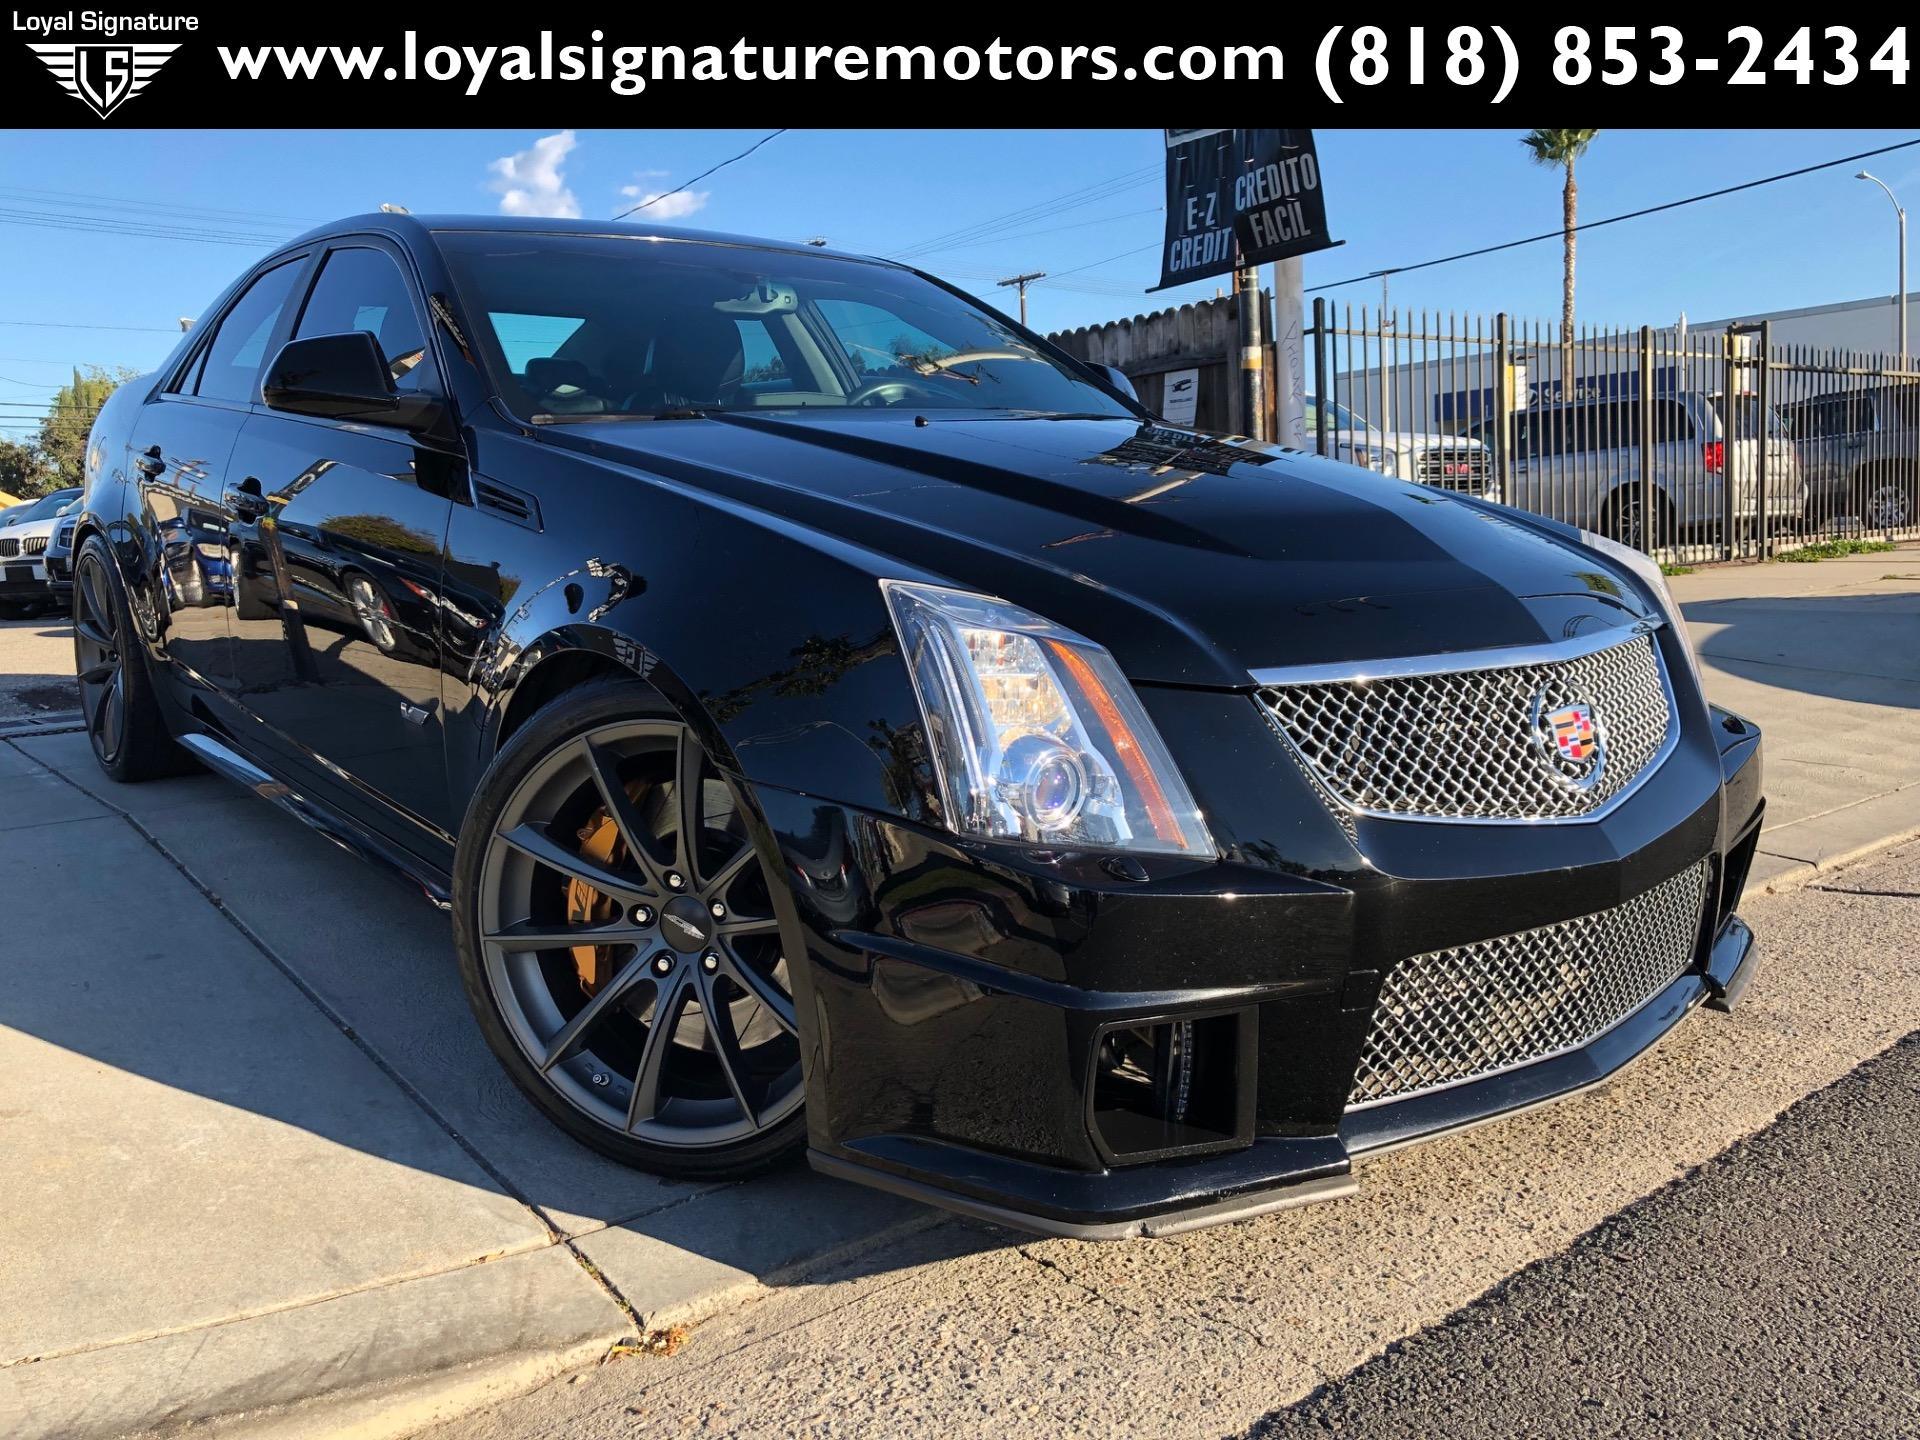 Cadillac Cts V Used >> Used 2009 Cadillac Cts V For Sale 29 995 Loyal